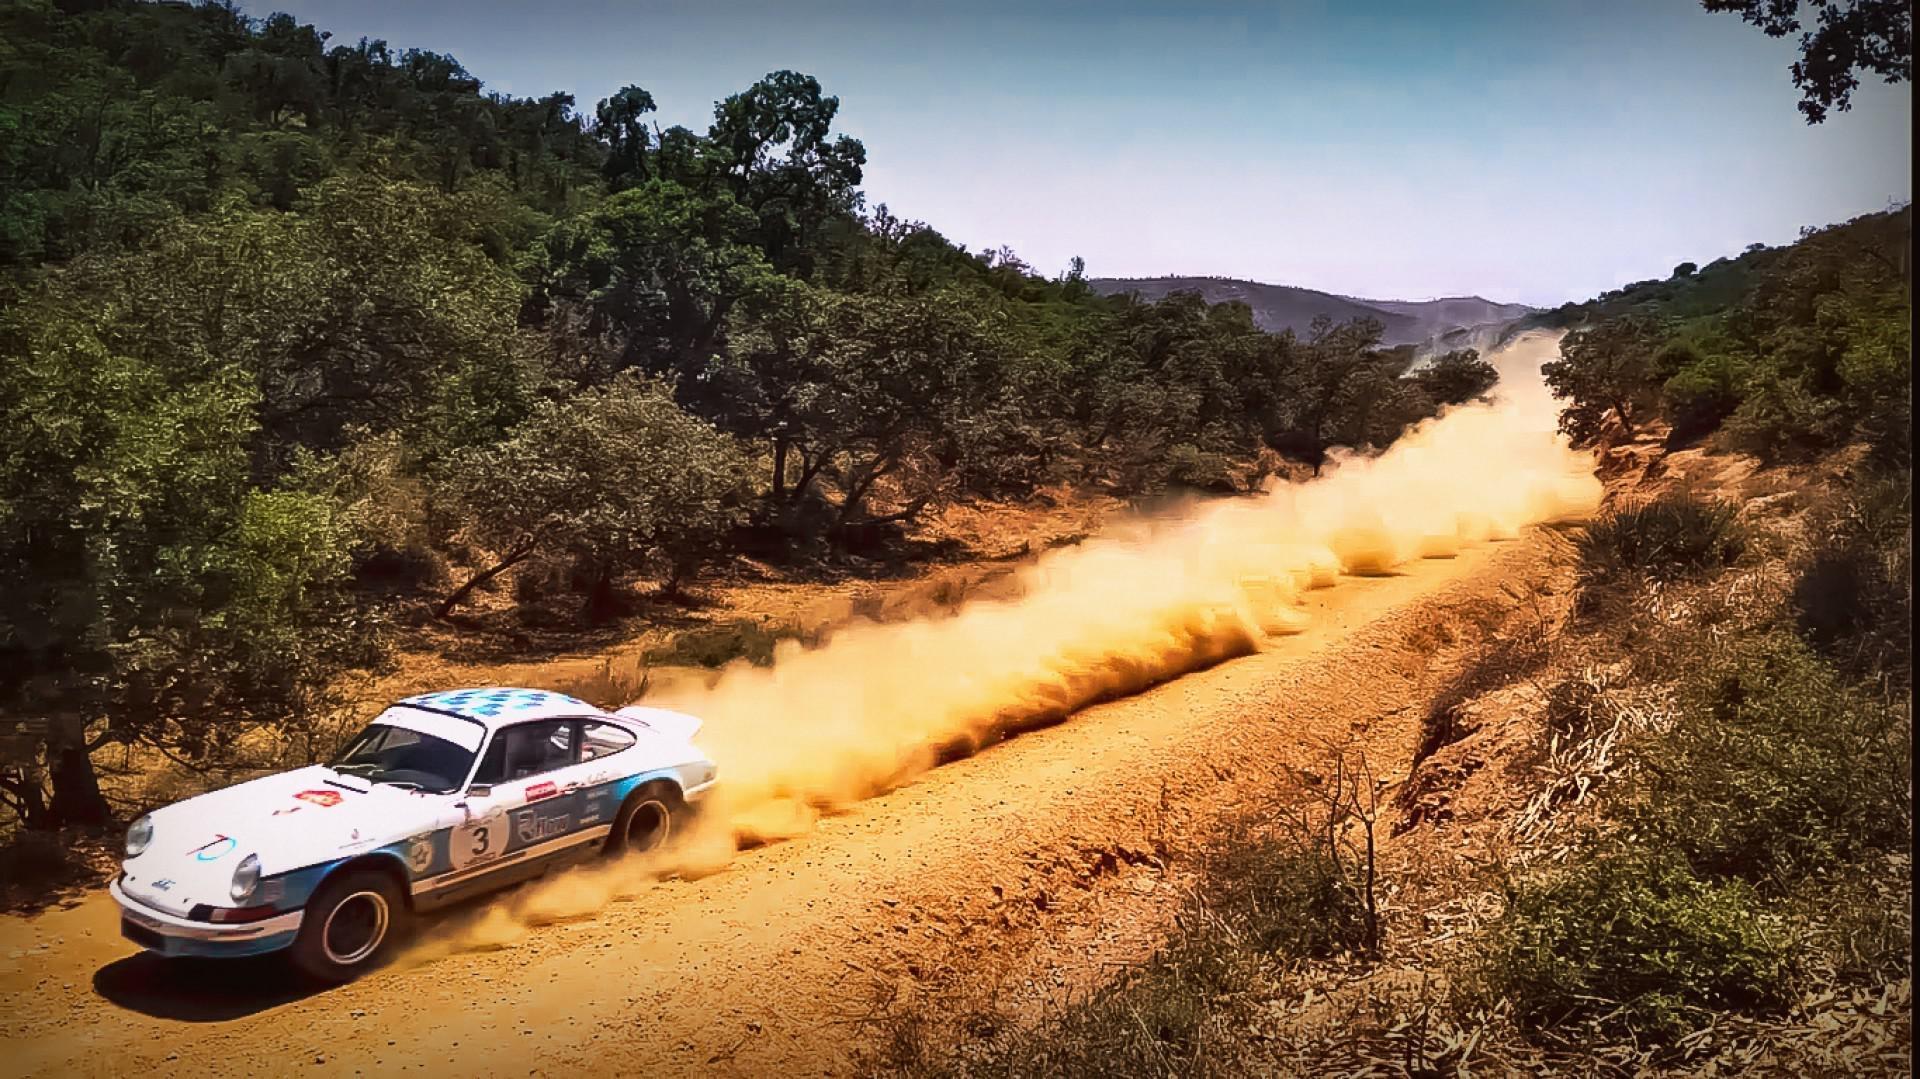 Maroc Historic Rally (MHR) 2018 : Oreille domine dès le jour 1